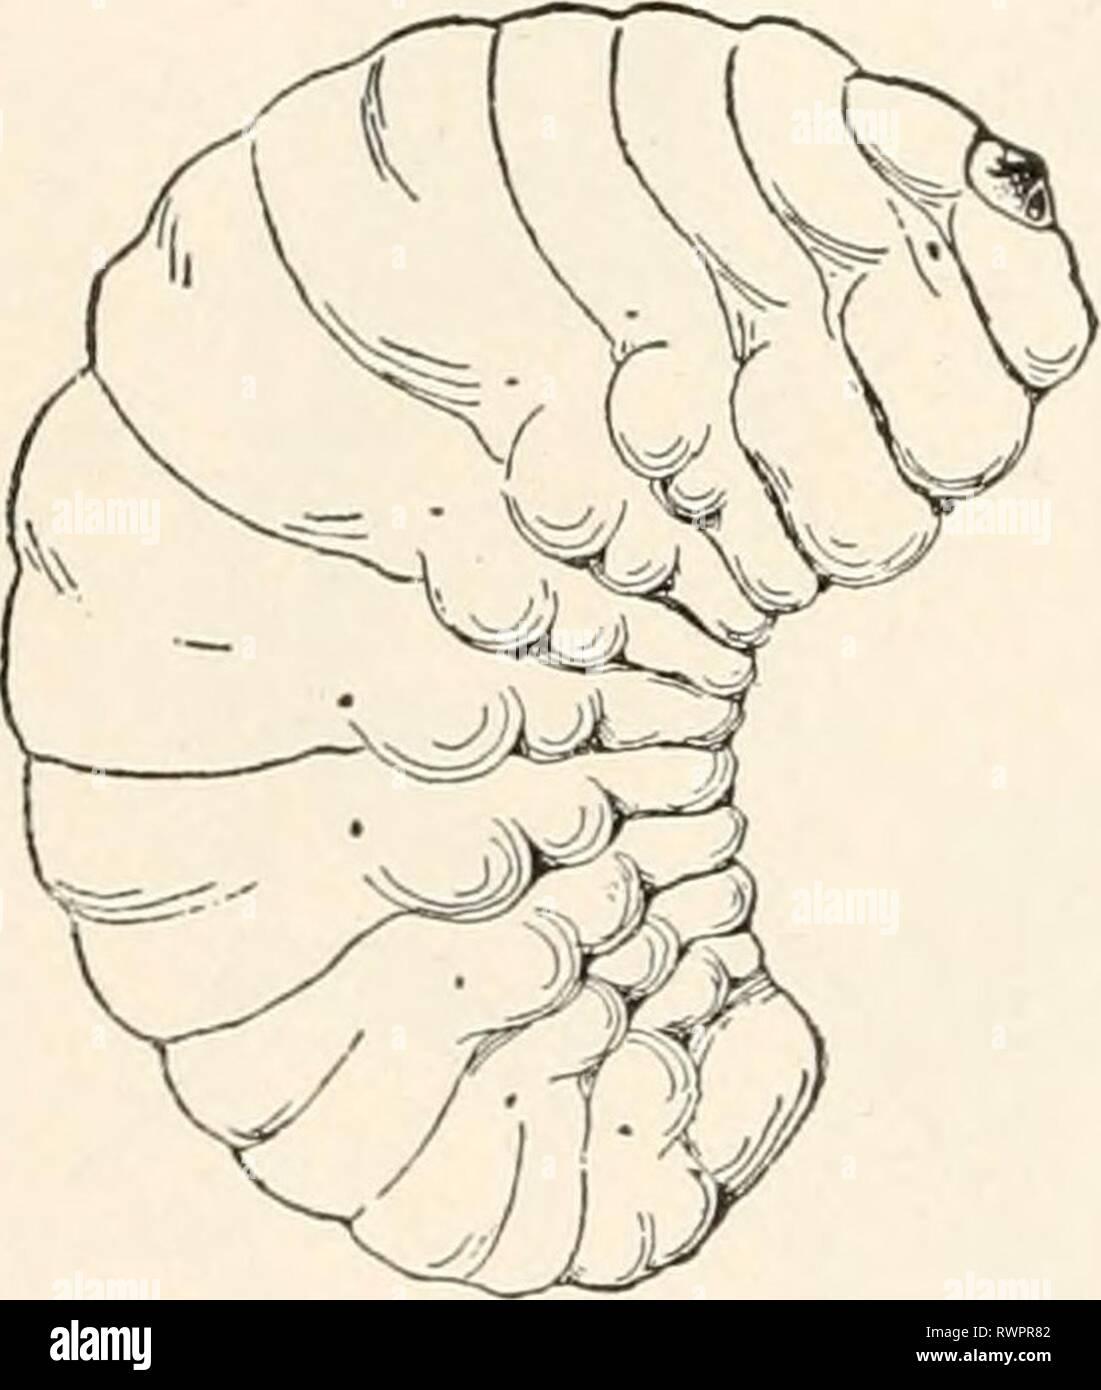 hight resolution of elementary entomology c1912 elementary entomology elementaryentomo00sand year c1912 a c